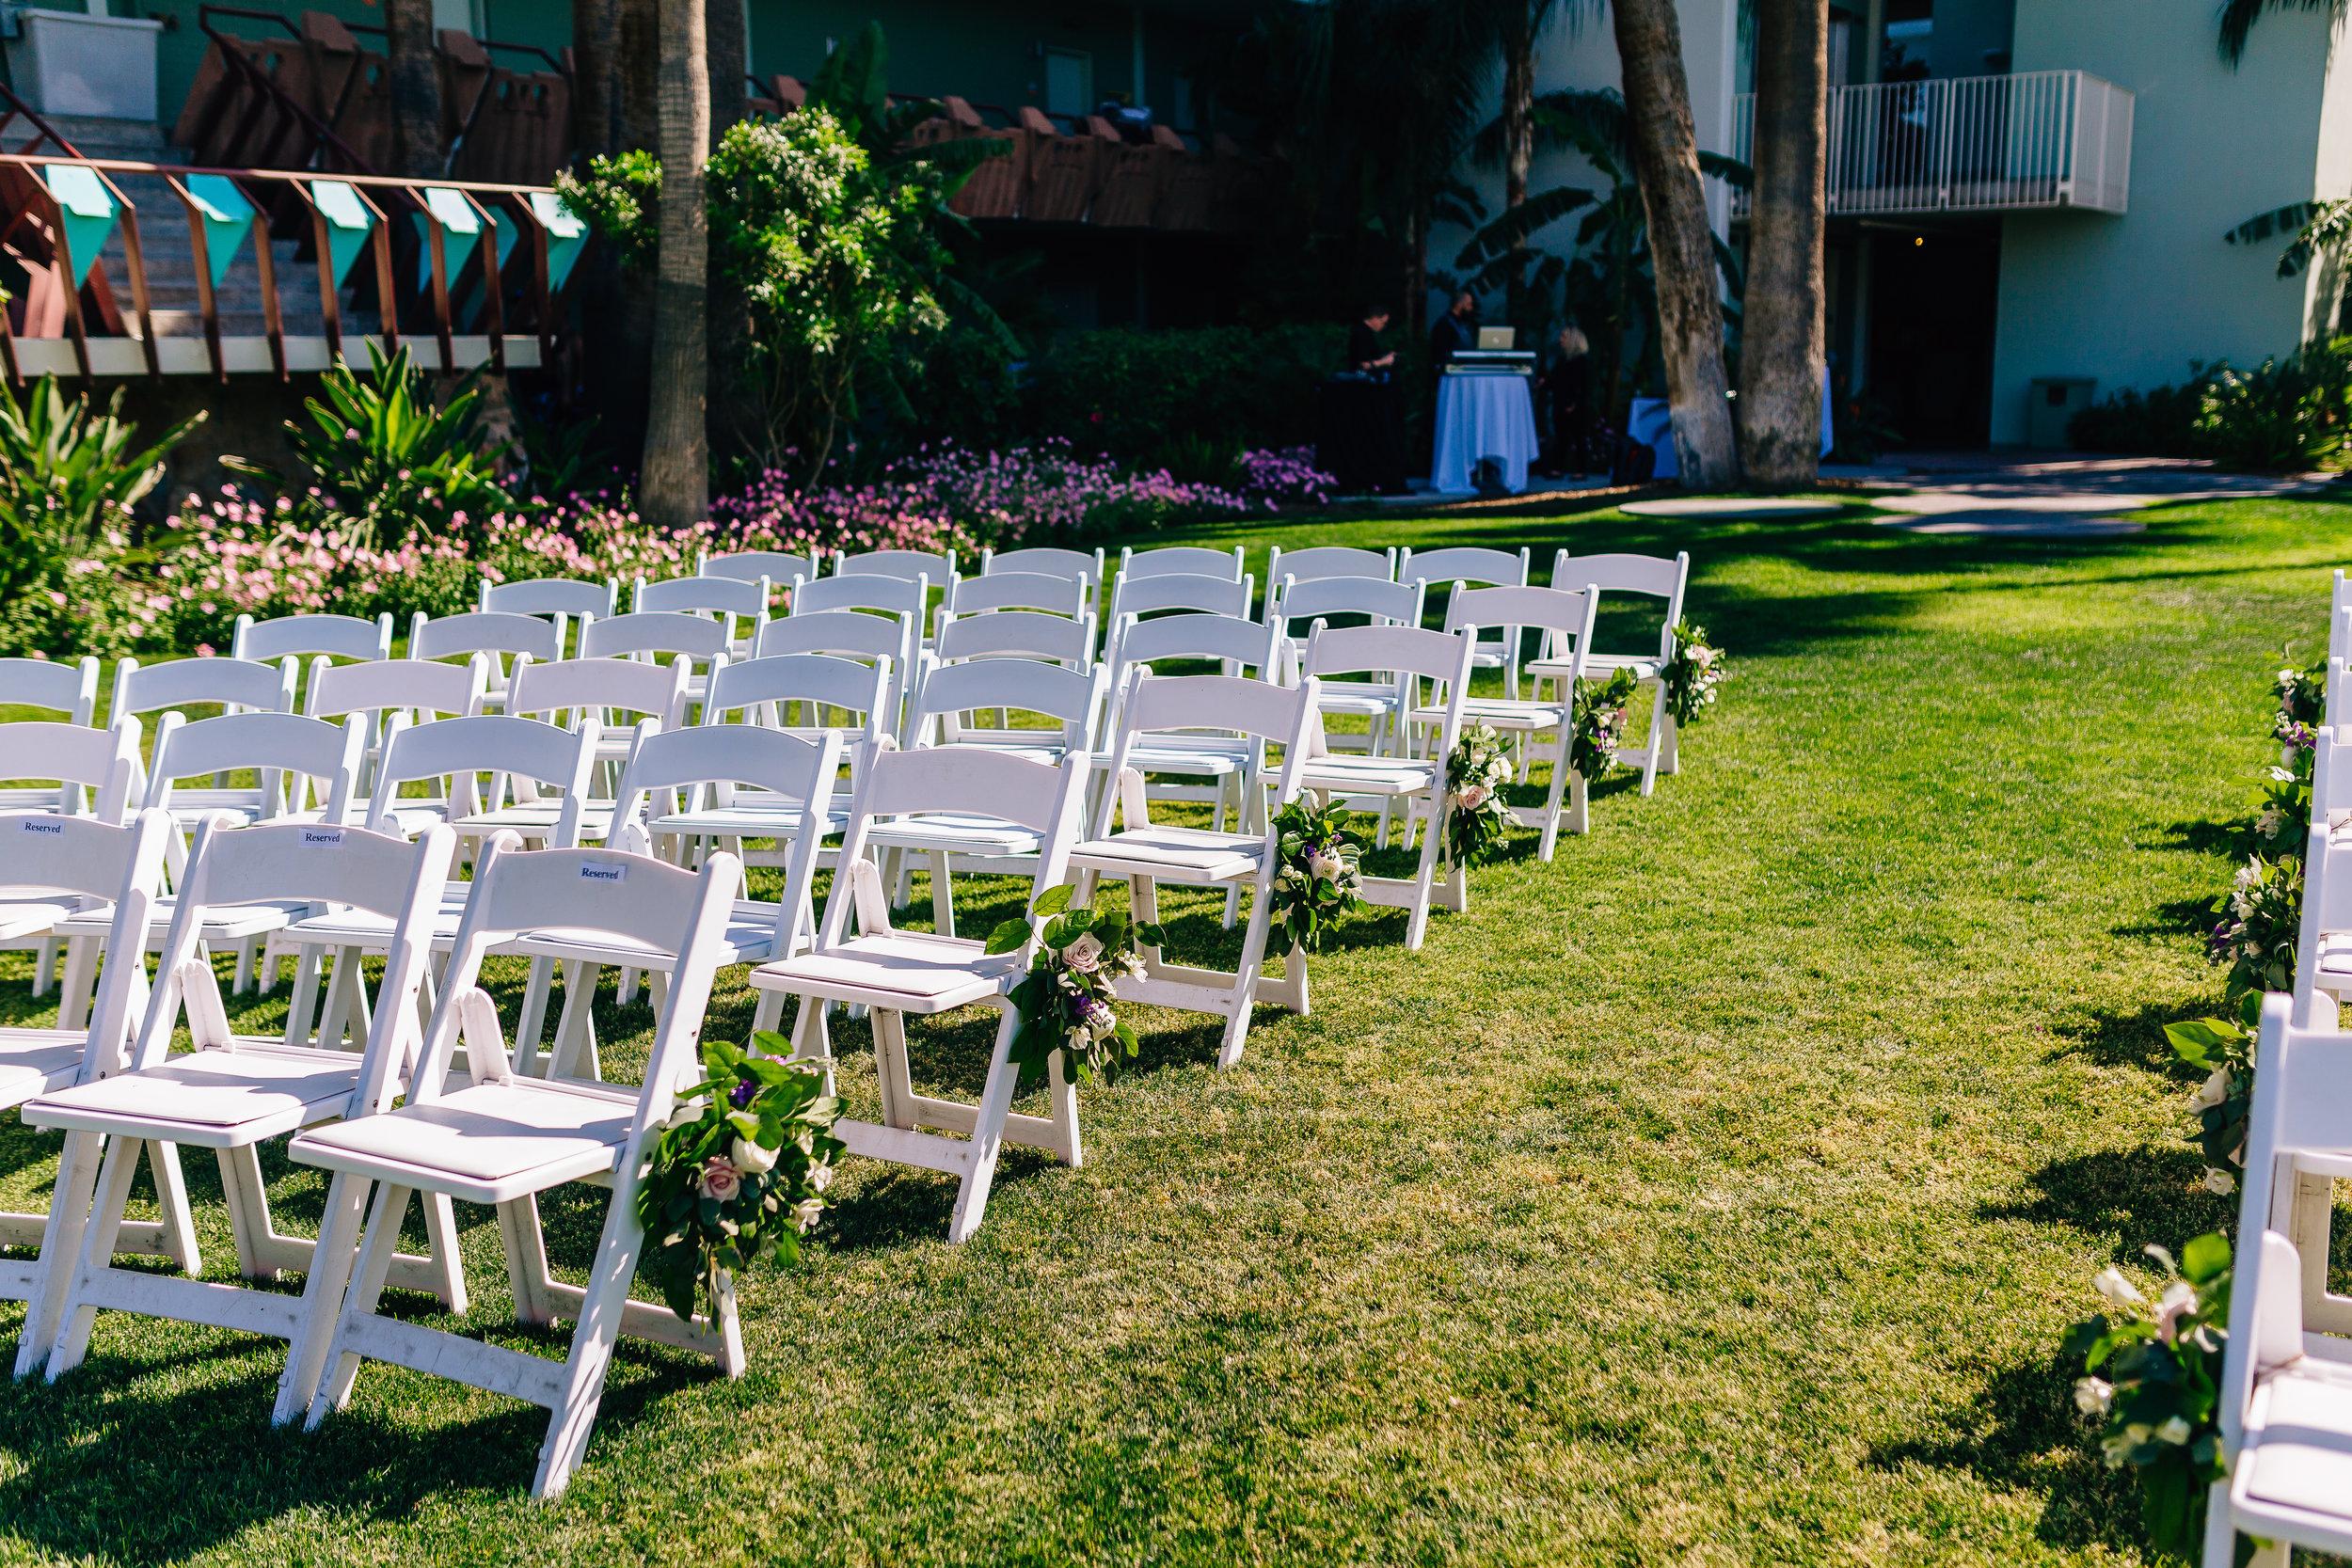 Desert Inspired Spring Wedding at Hotel Valley Ho - Ceremony Chair Decor